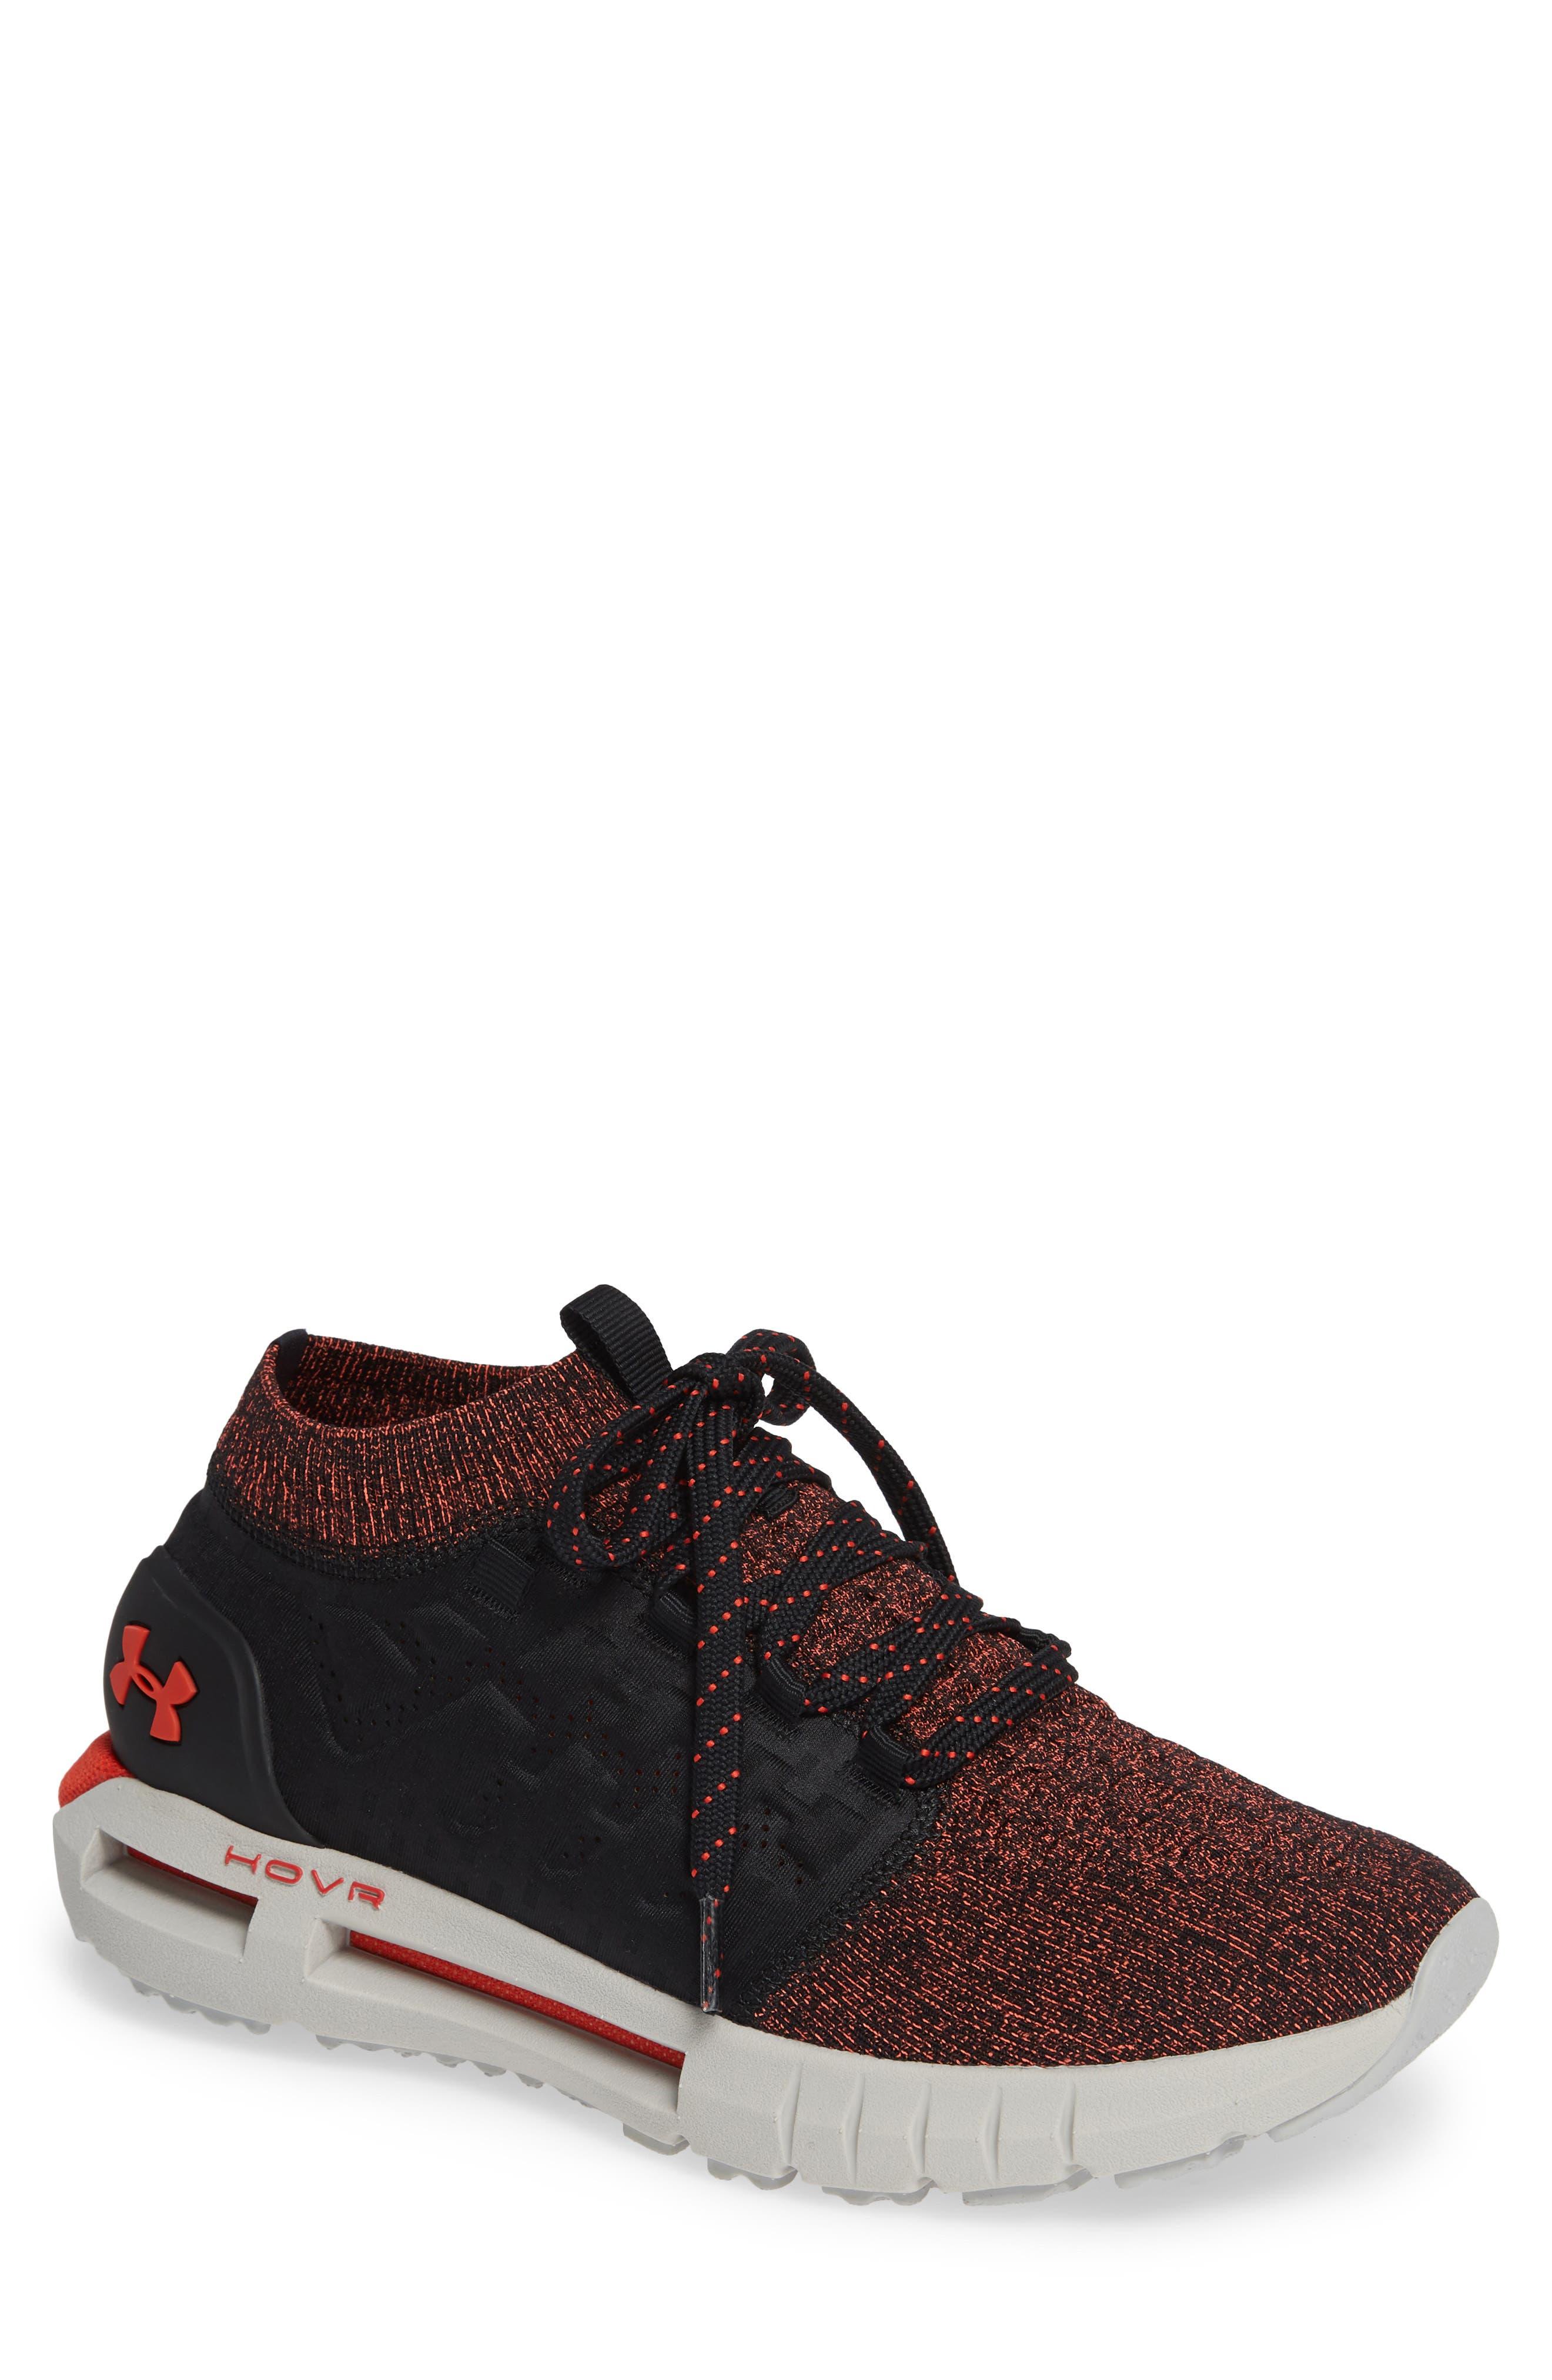 HOVR Phantom NC Sneaker,                         Main,                         color, Black/ Ghost Grey/ Radio Red